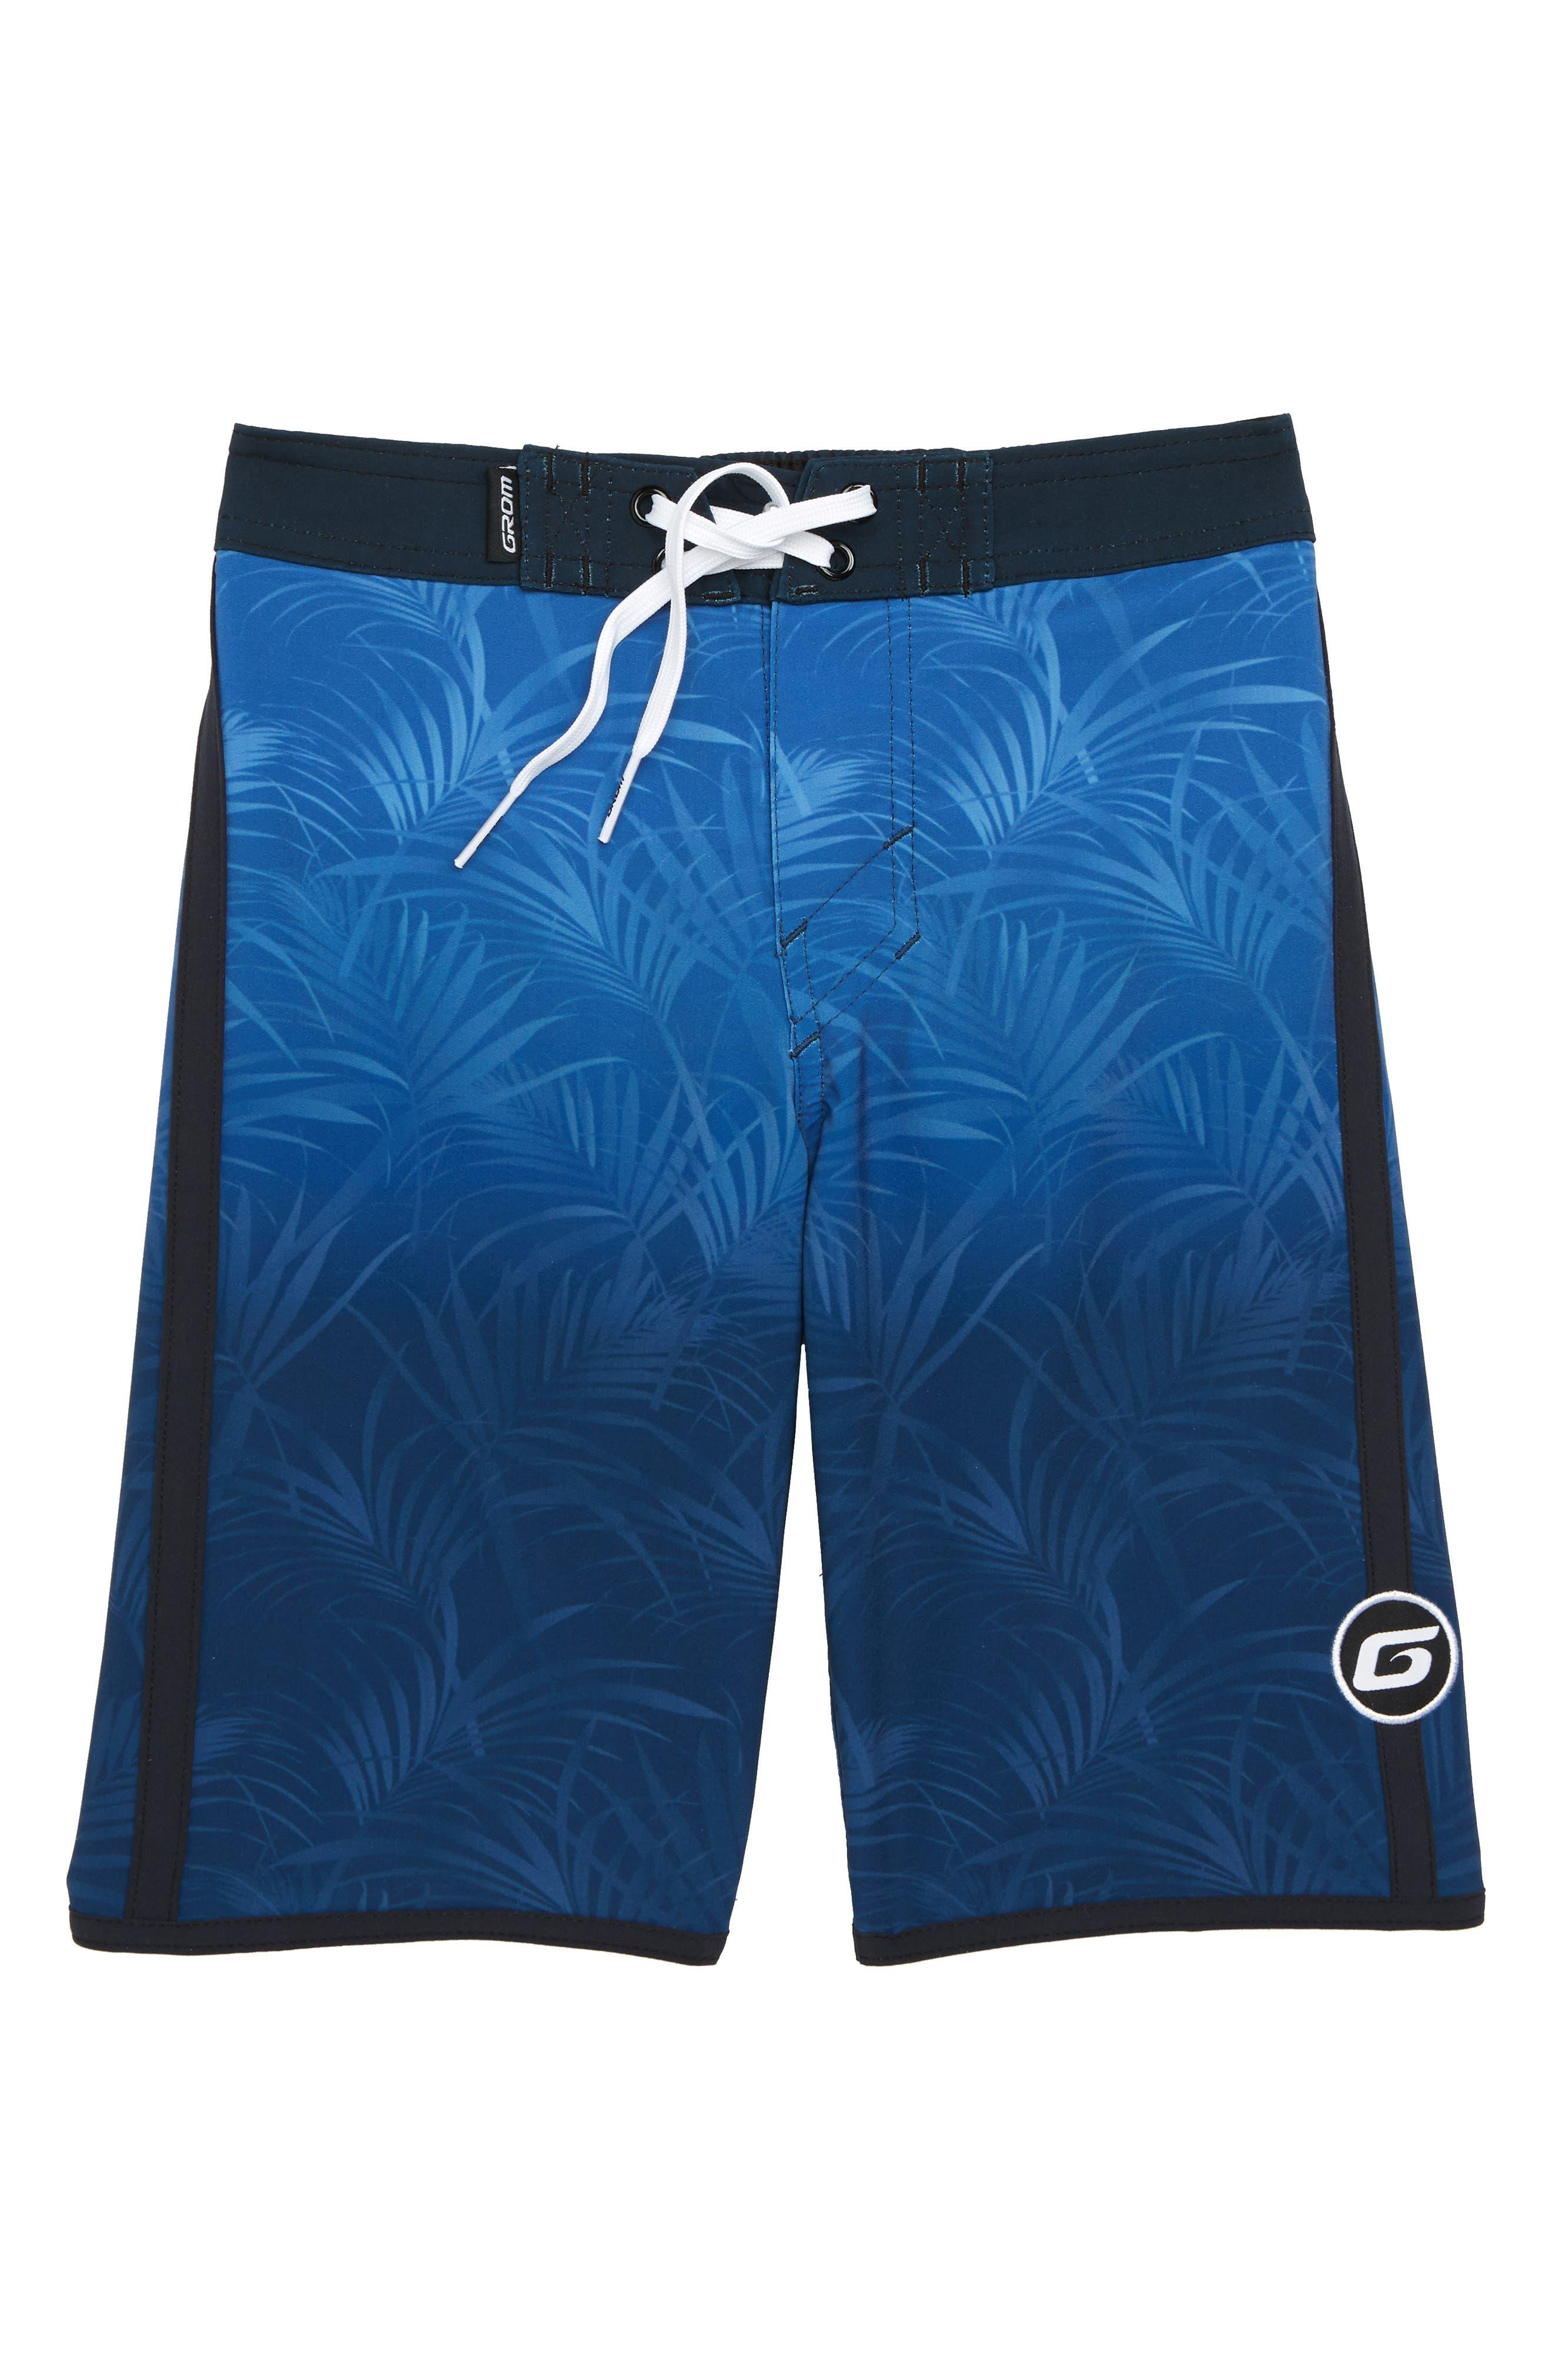 Palm Fade Board Shorts,                         Main,                         color, BLUE